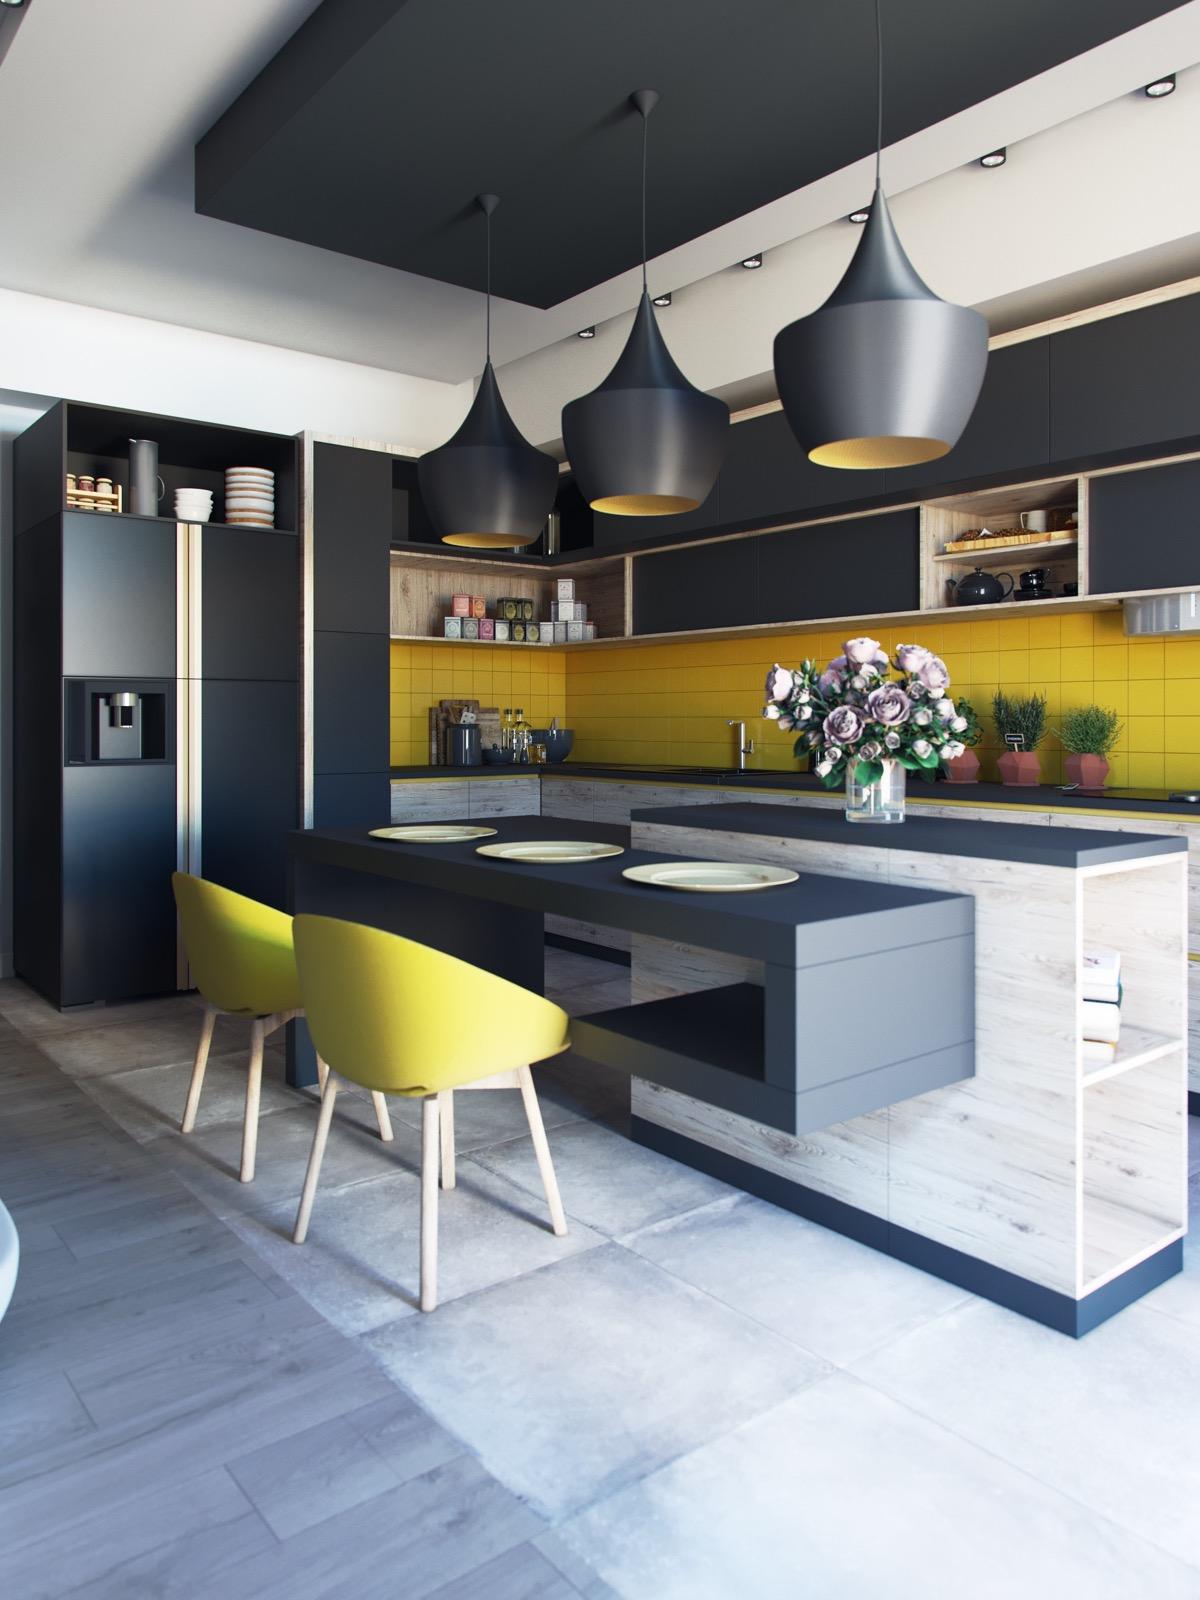 Kutchina modular kitchen price in kolkata Call 8599975372